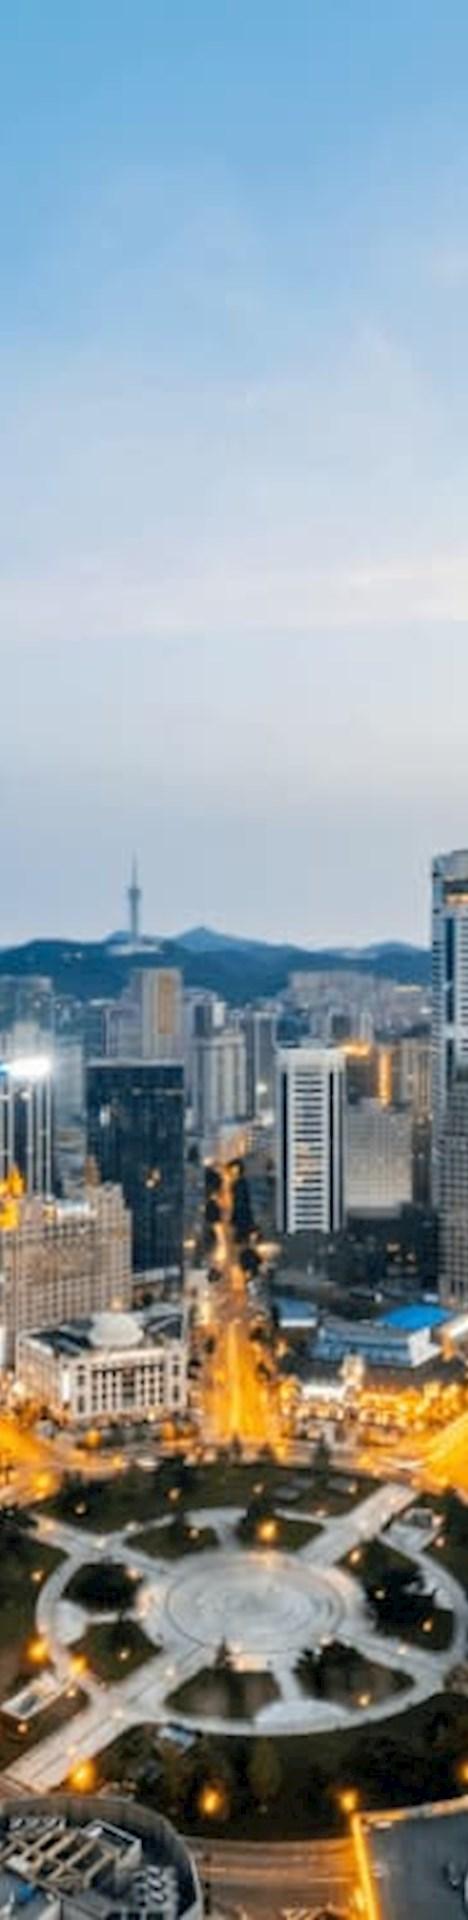 Skyline of Dalian, China